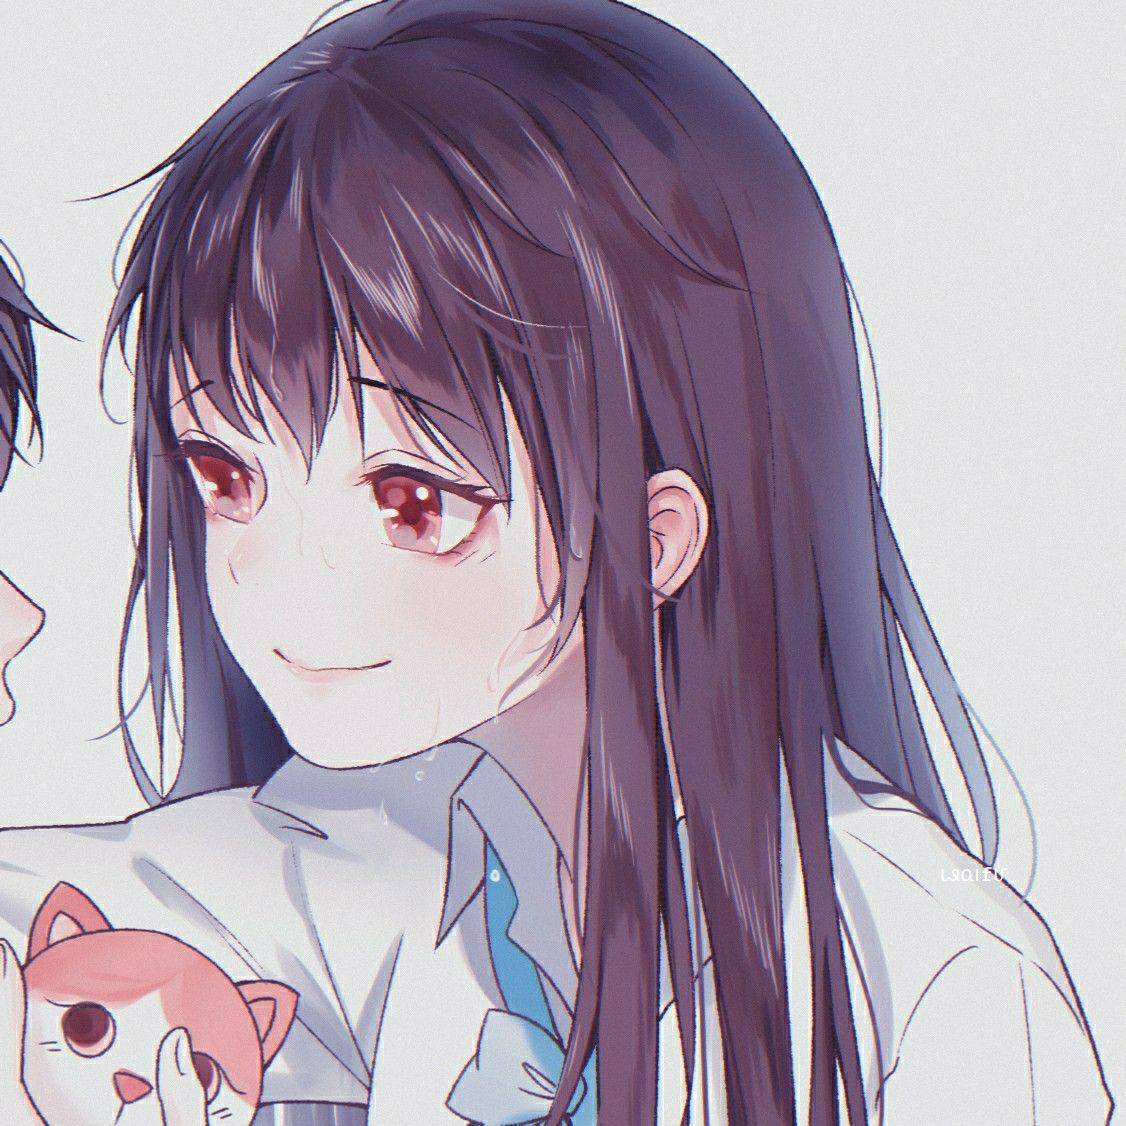 Pin Oleh Rineshu Di Matching Pfp Di 2020 Gambar Karakter Gambar Anime Gambar